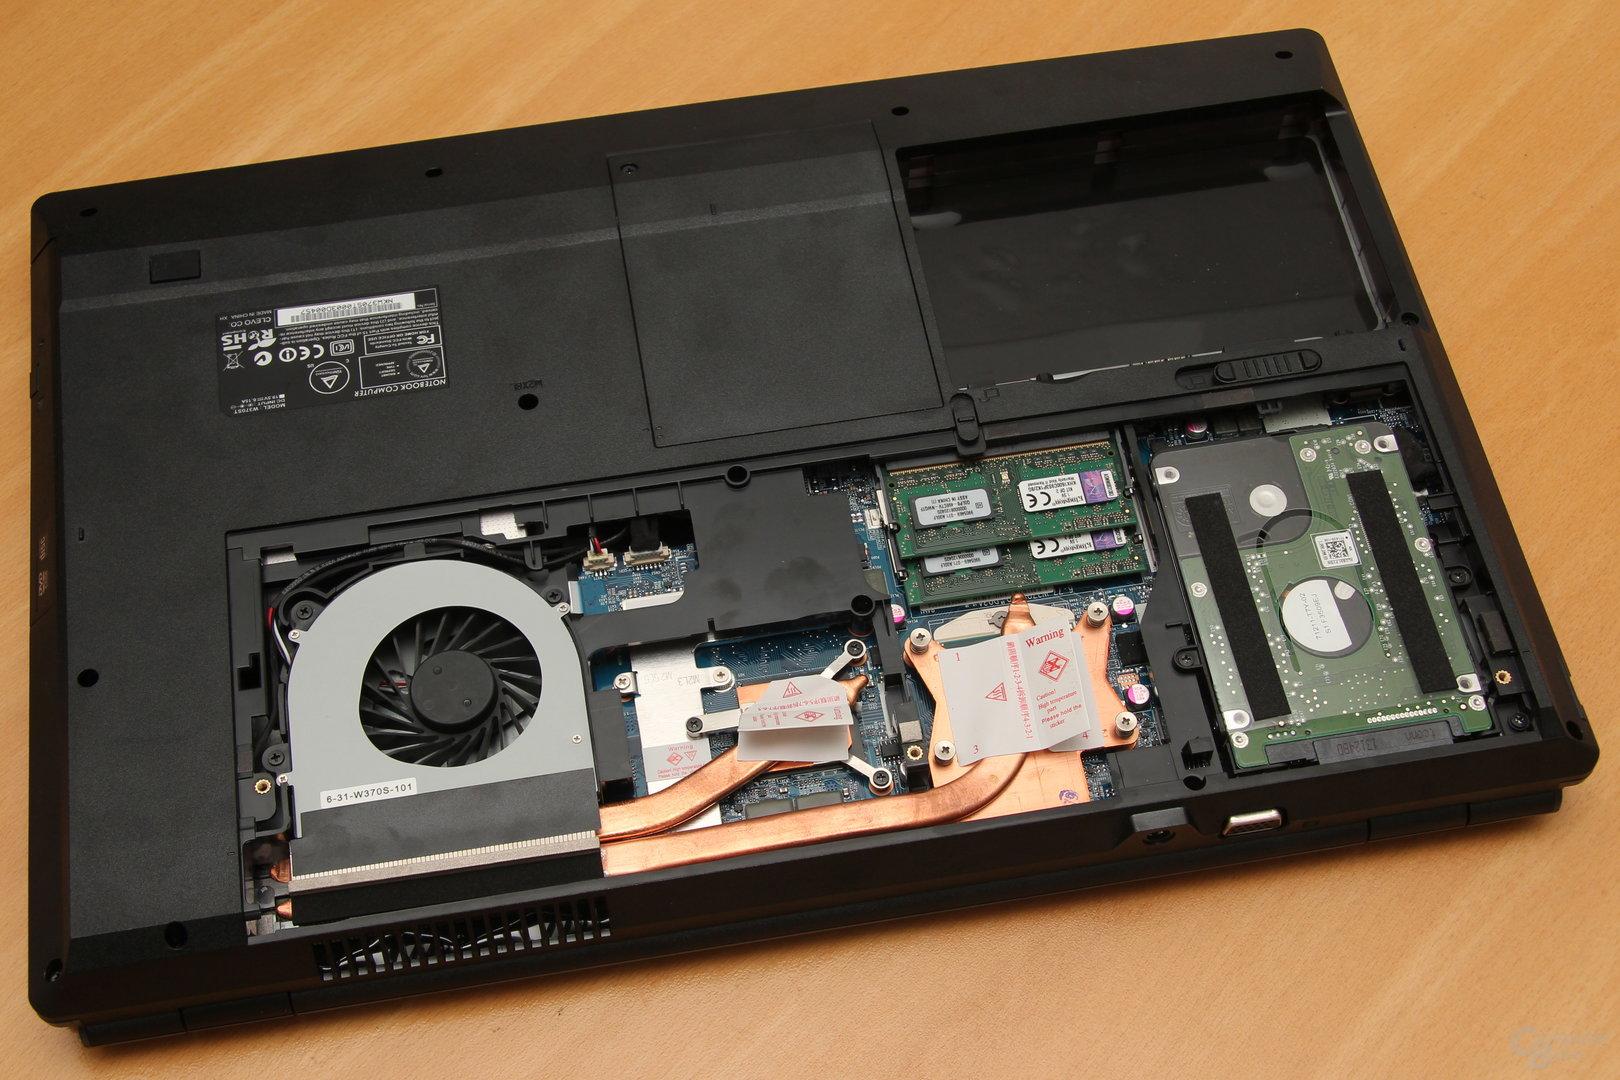 HawkForce W370ST – Hardware